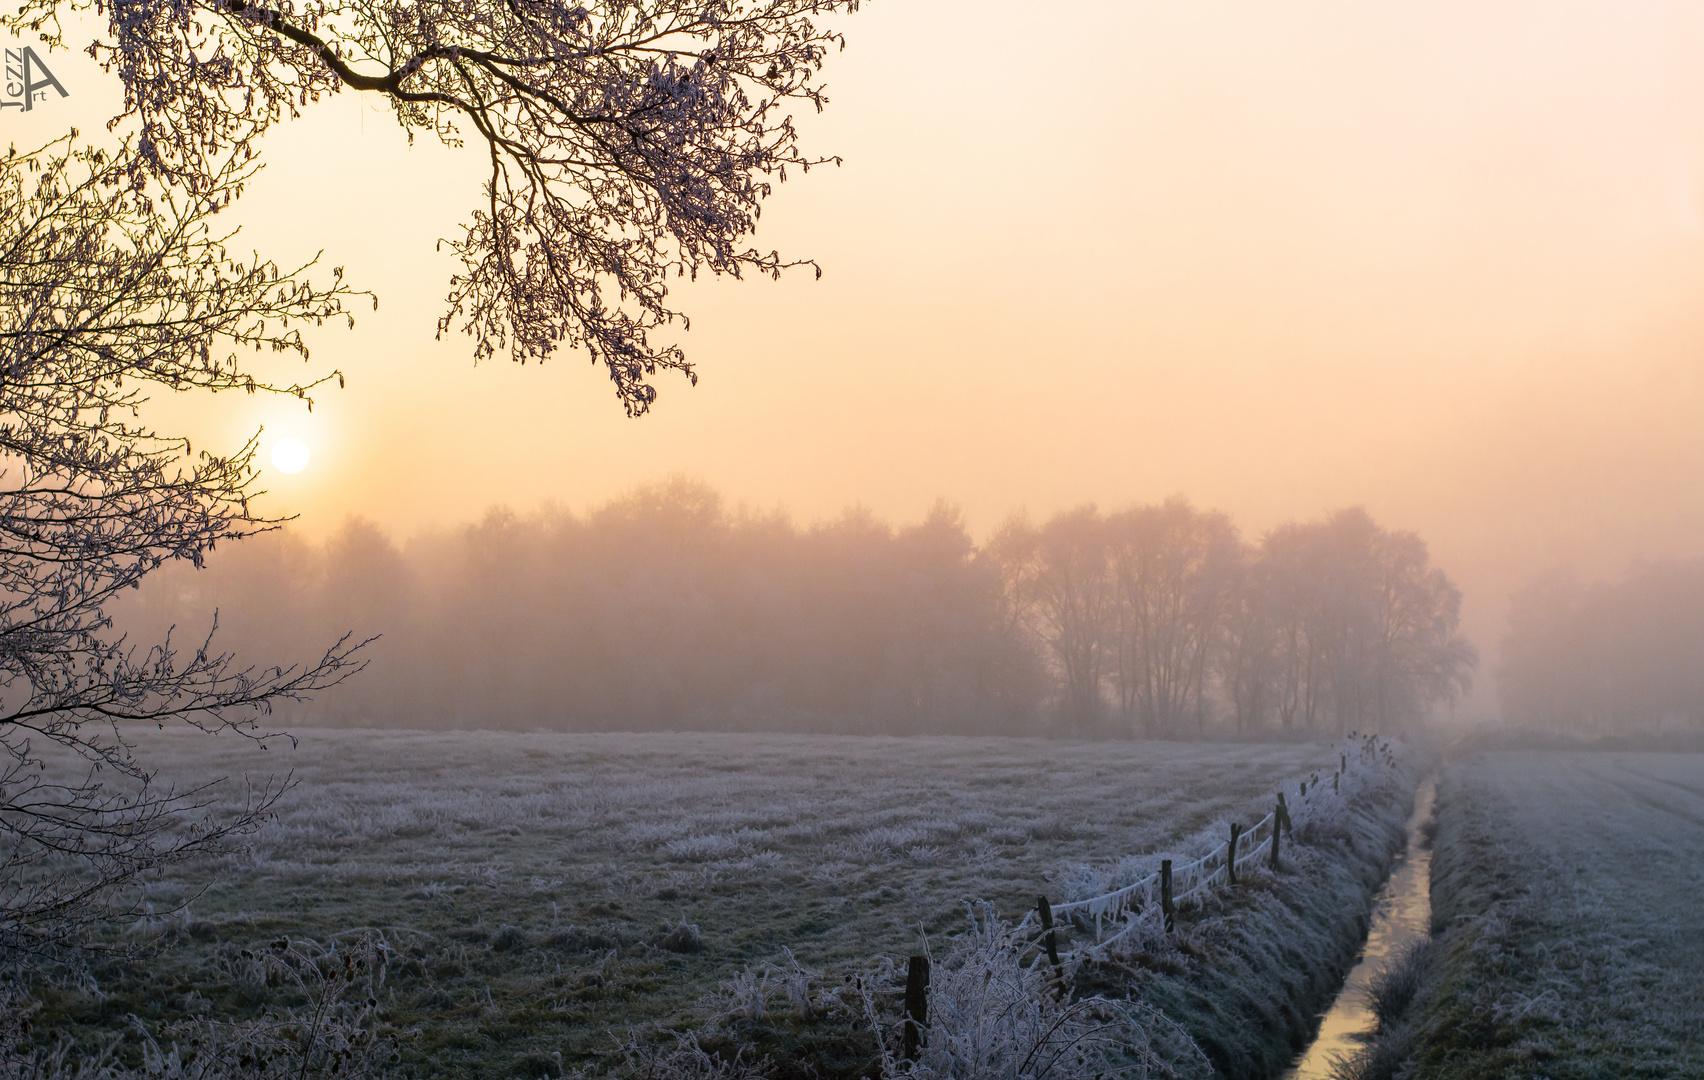 Vereiste Landschaft im Nebel.